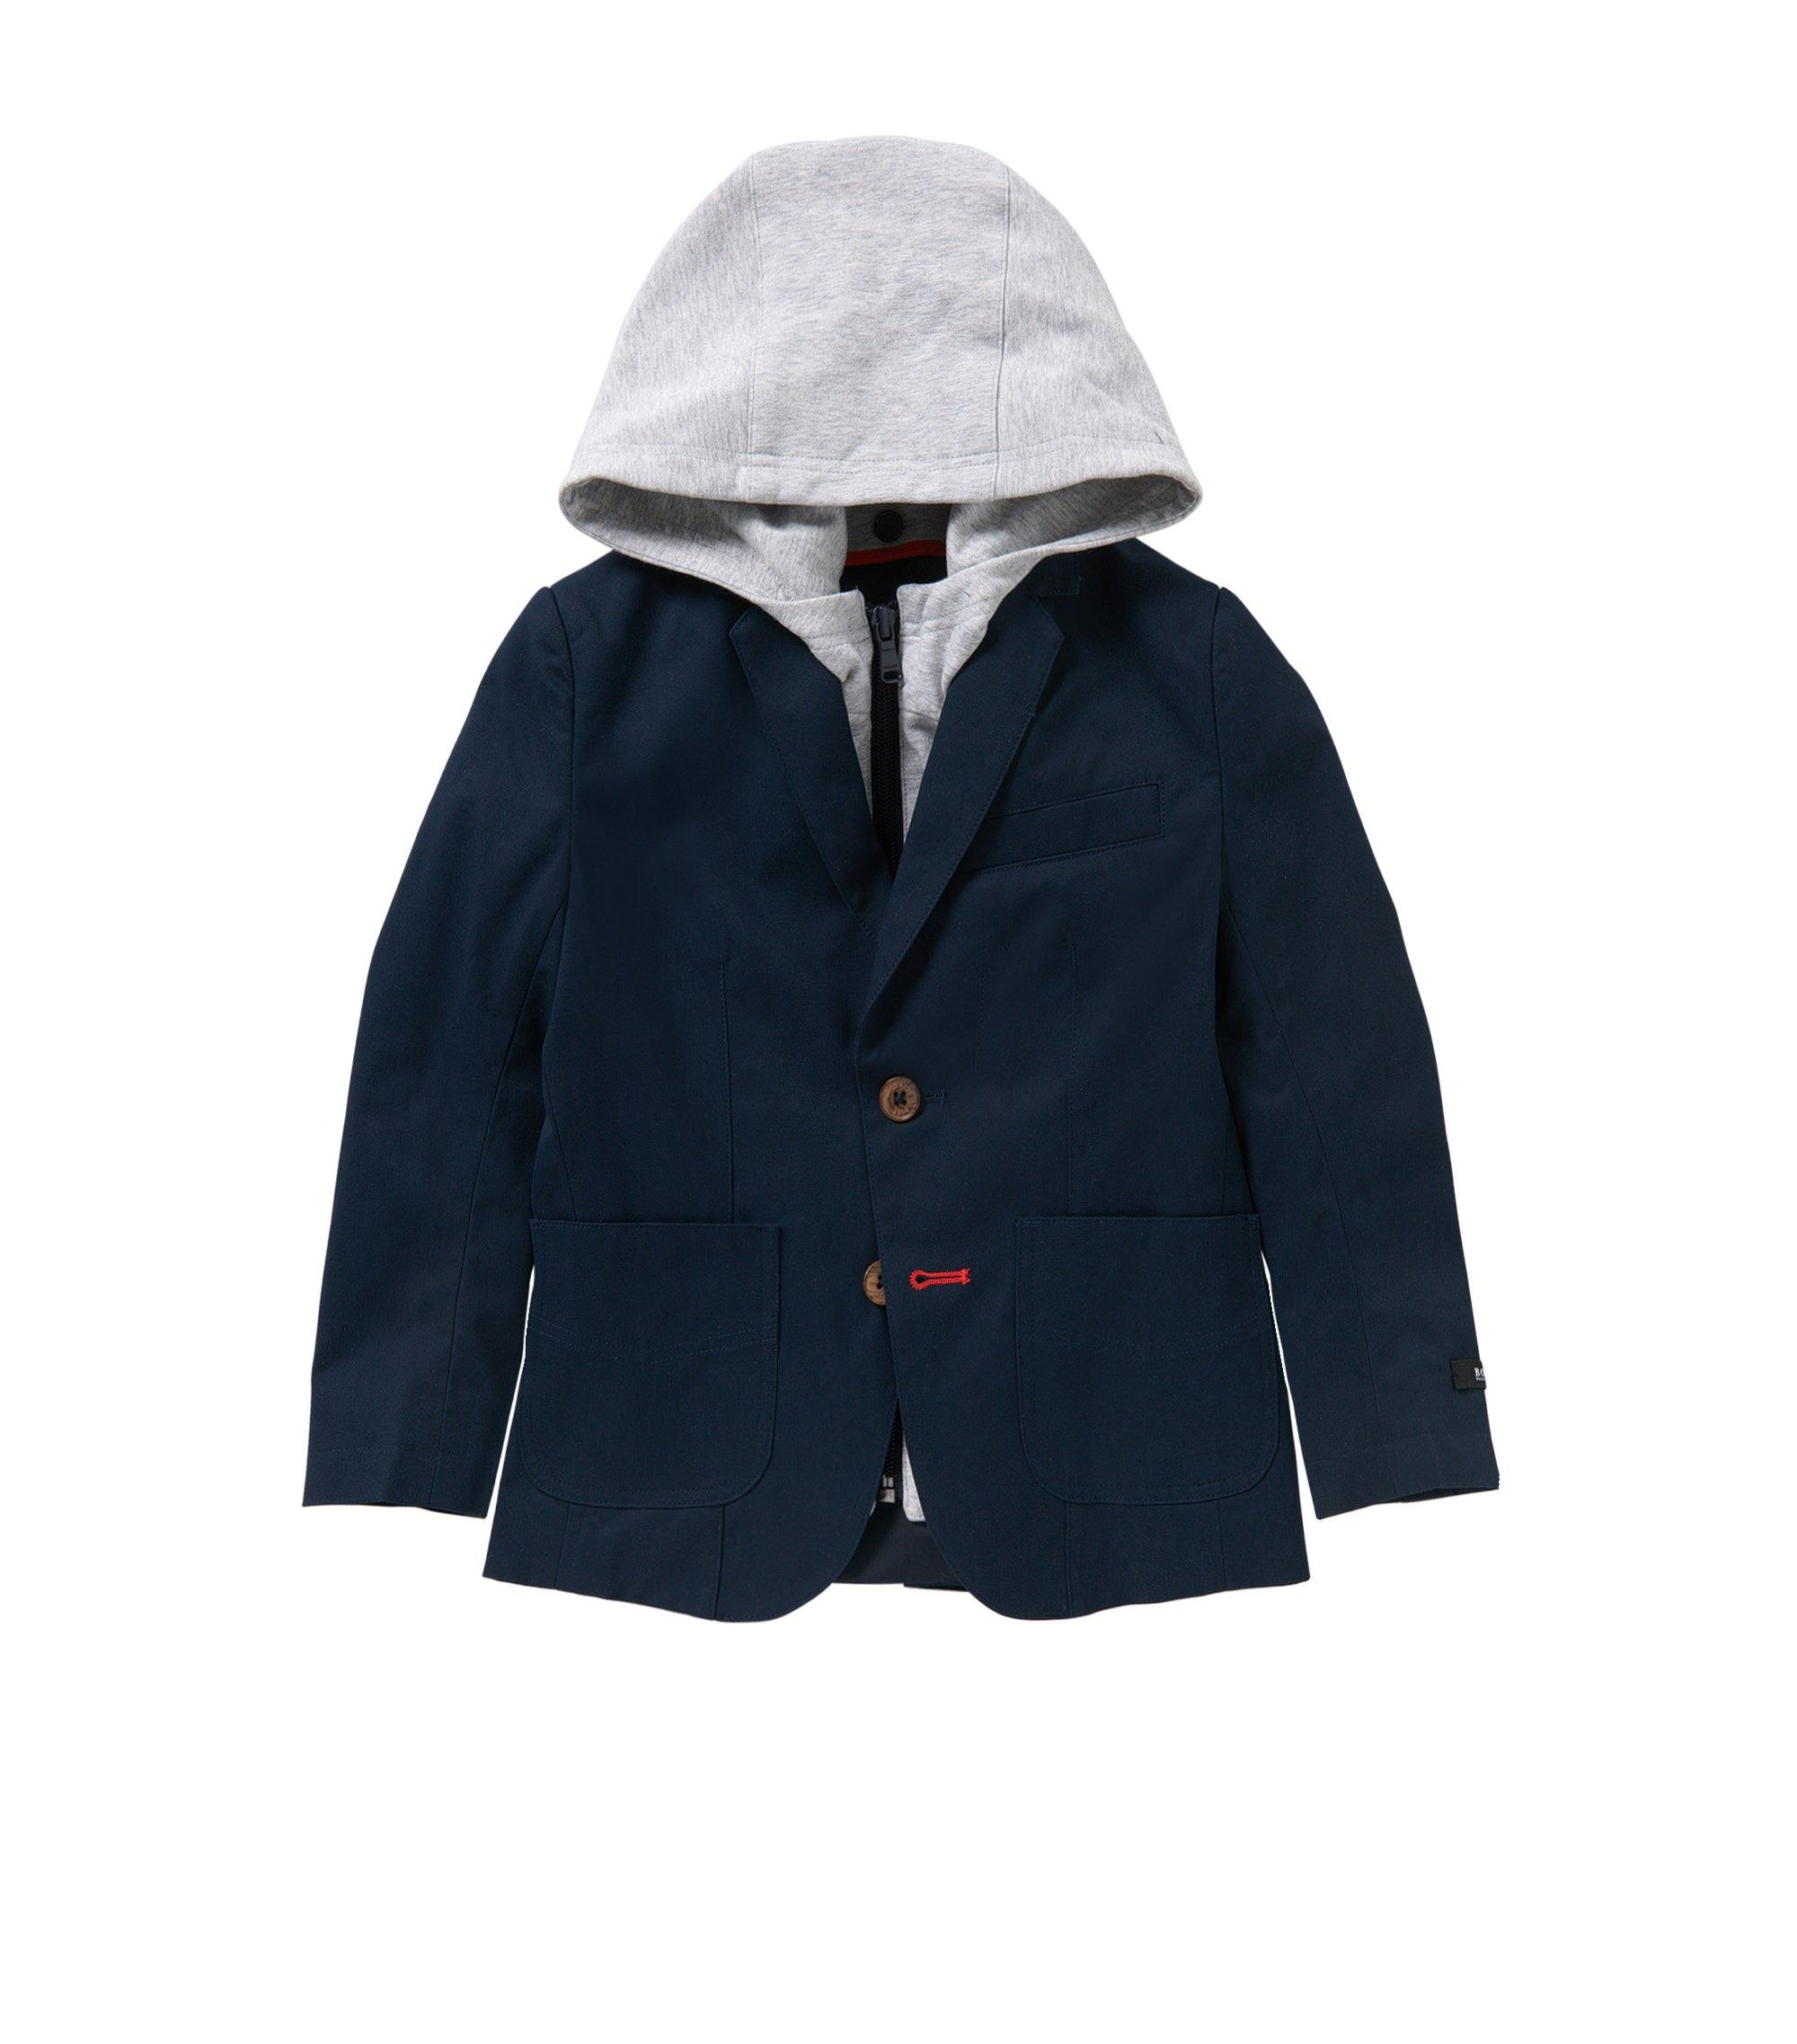 'J26276'   Boys Suit Jacket, Removable Hood, Dark Blue